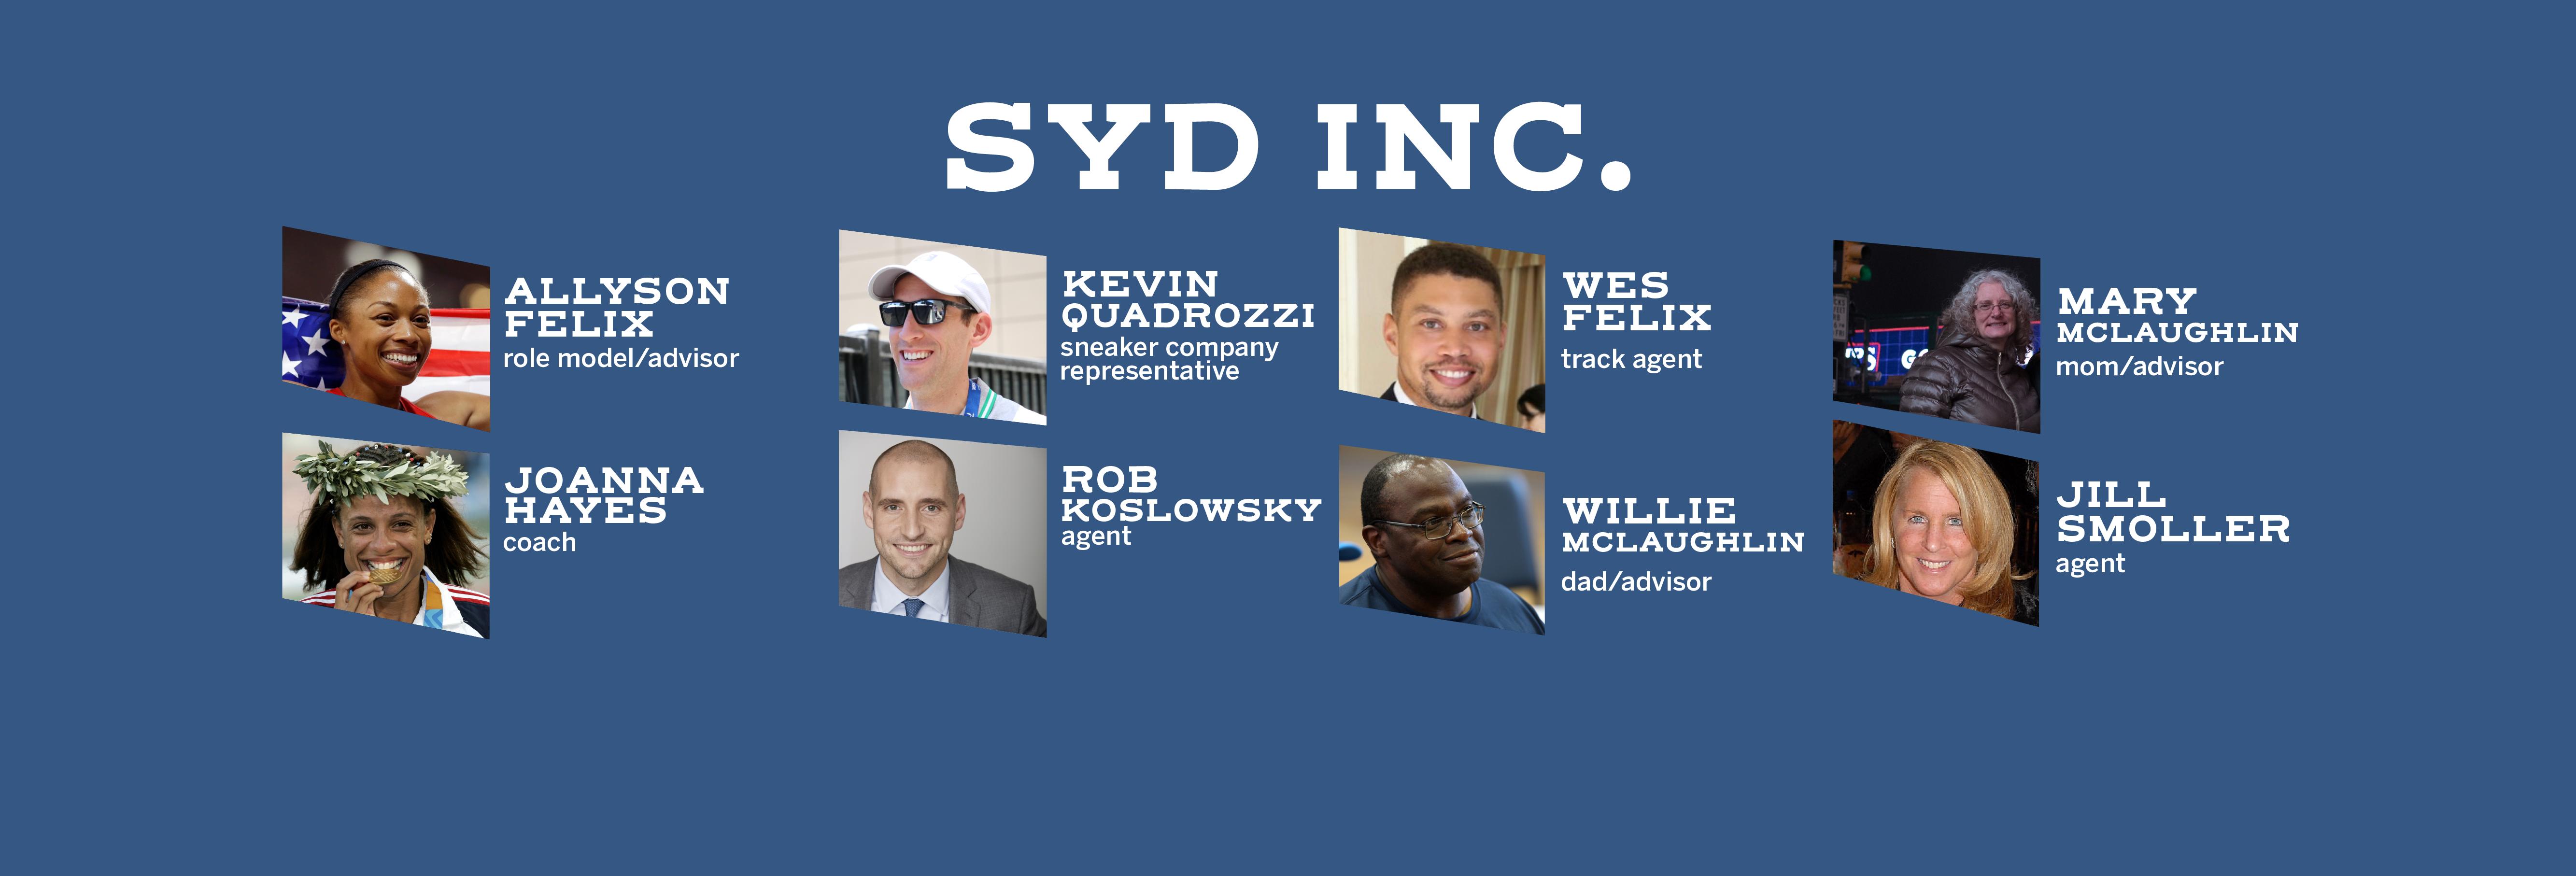 Sydney's business teammates